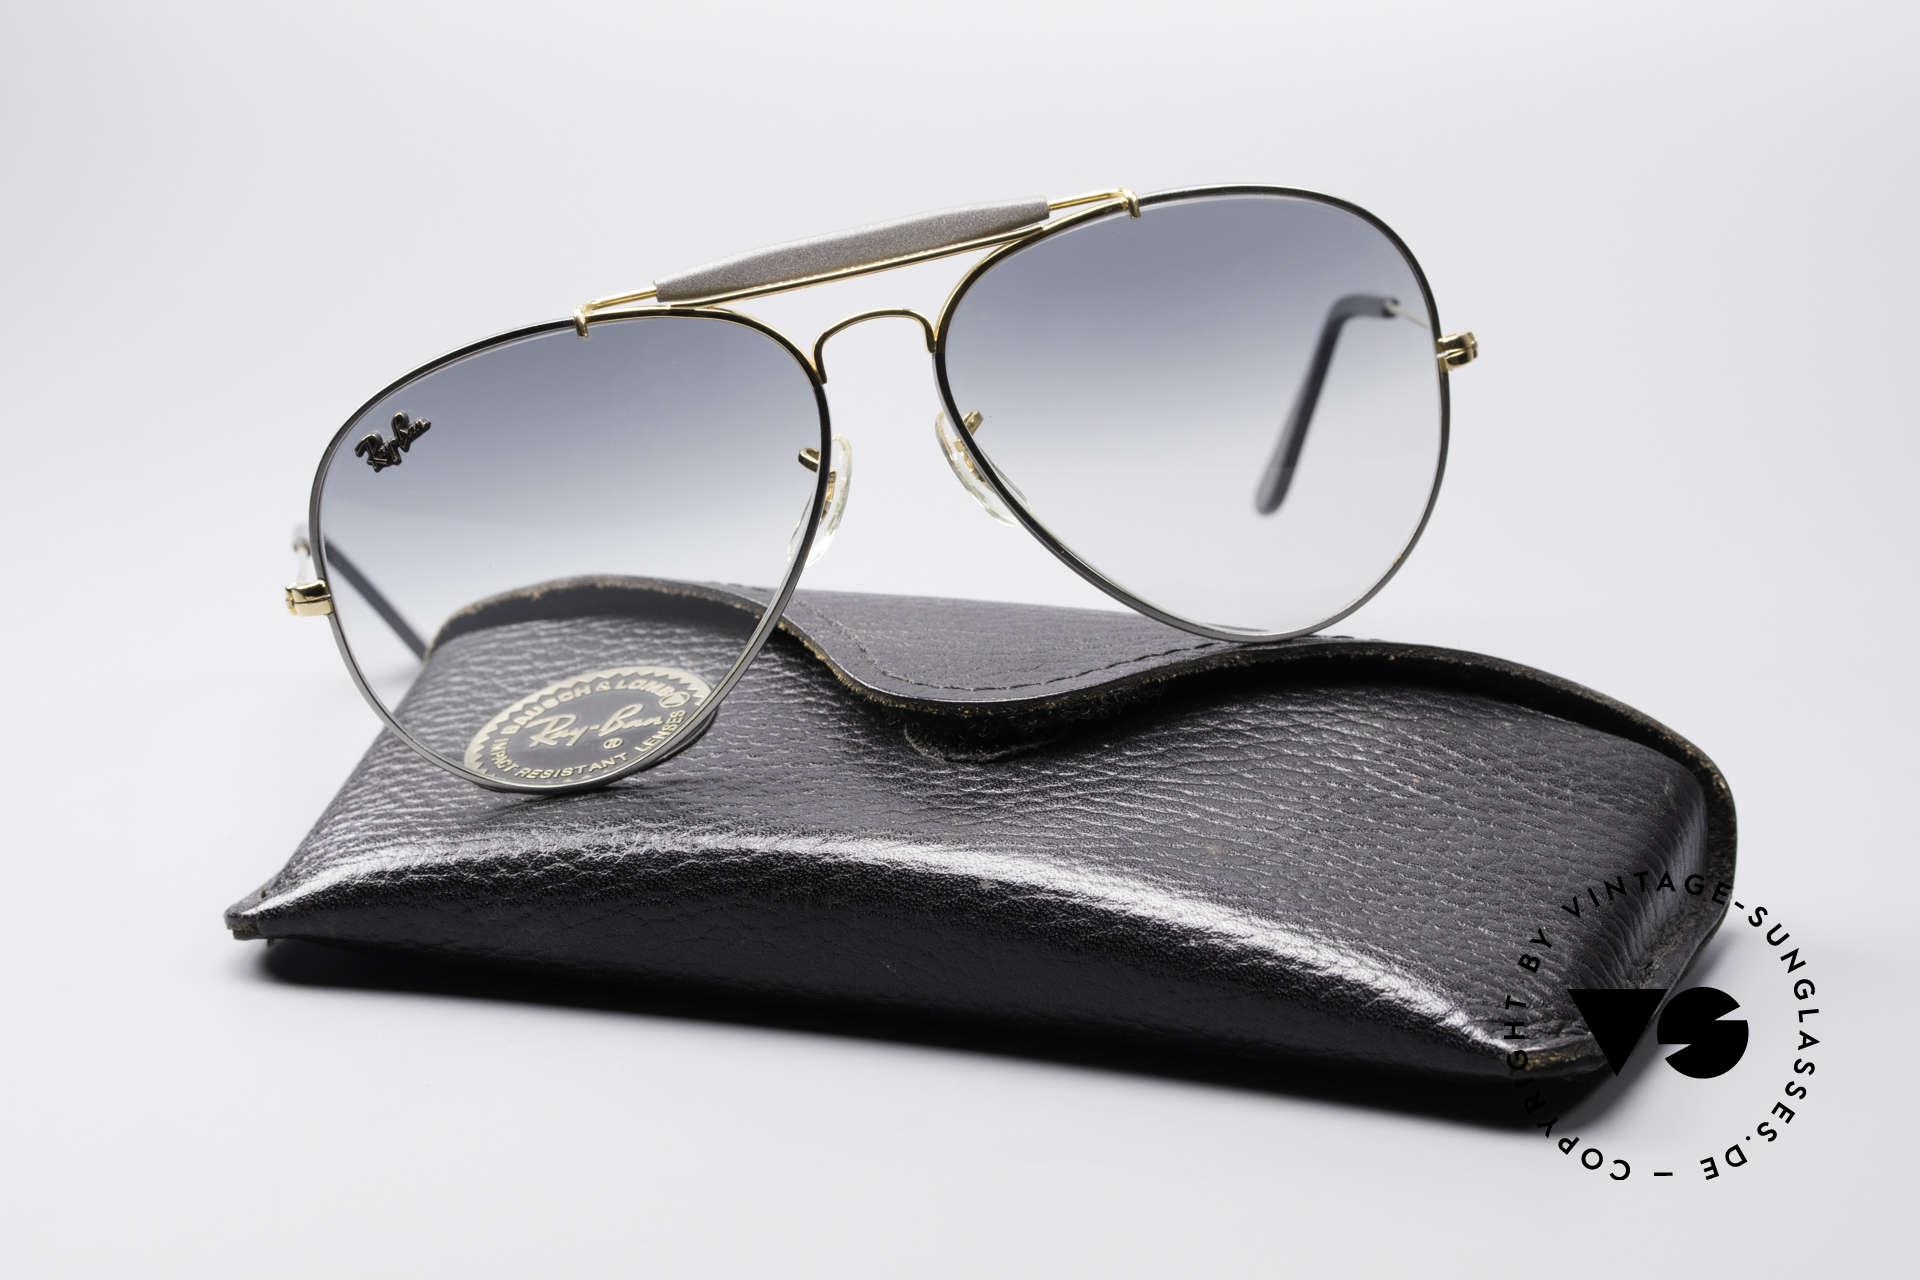 Sonnenbrillen Ray Ban Outdoorsman II Precious Metals Titanium   Vintage  Sunglasses 8a4b88c843ff